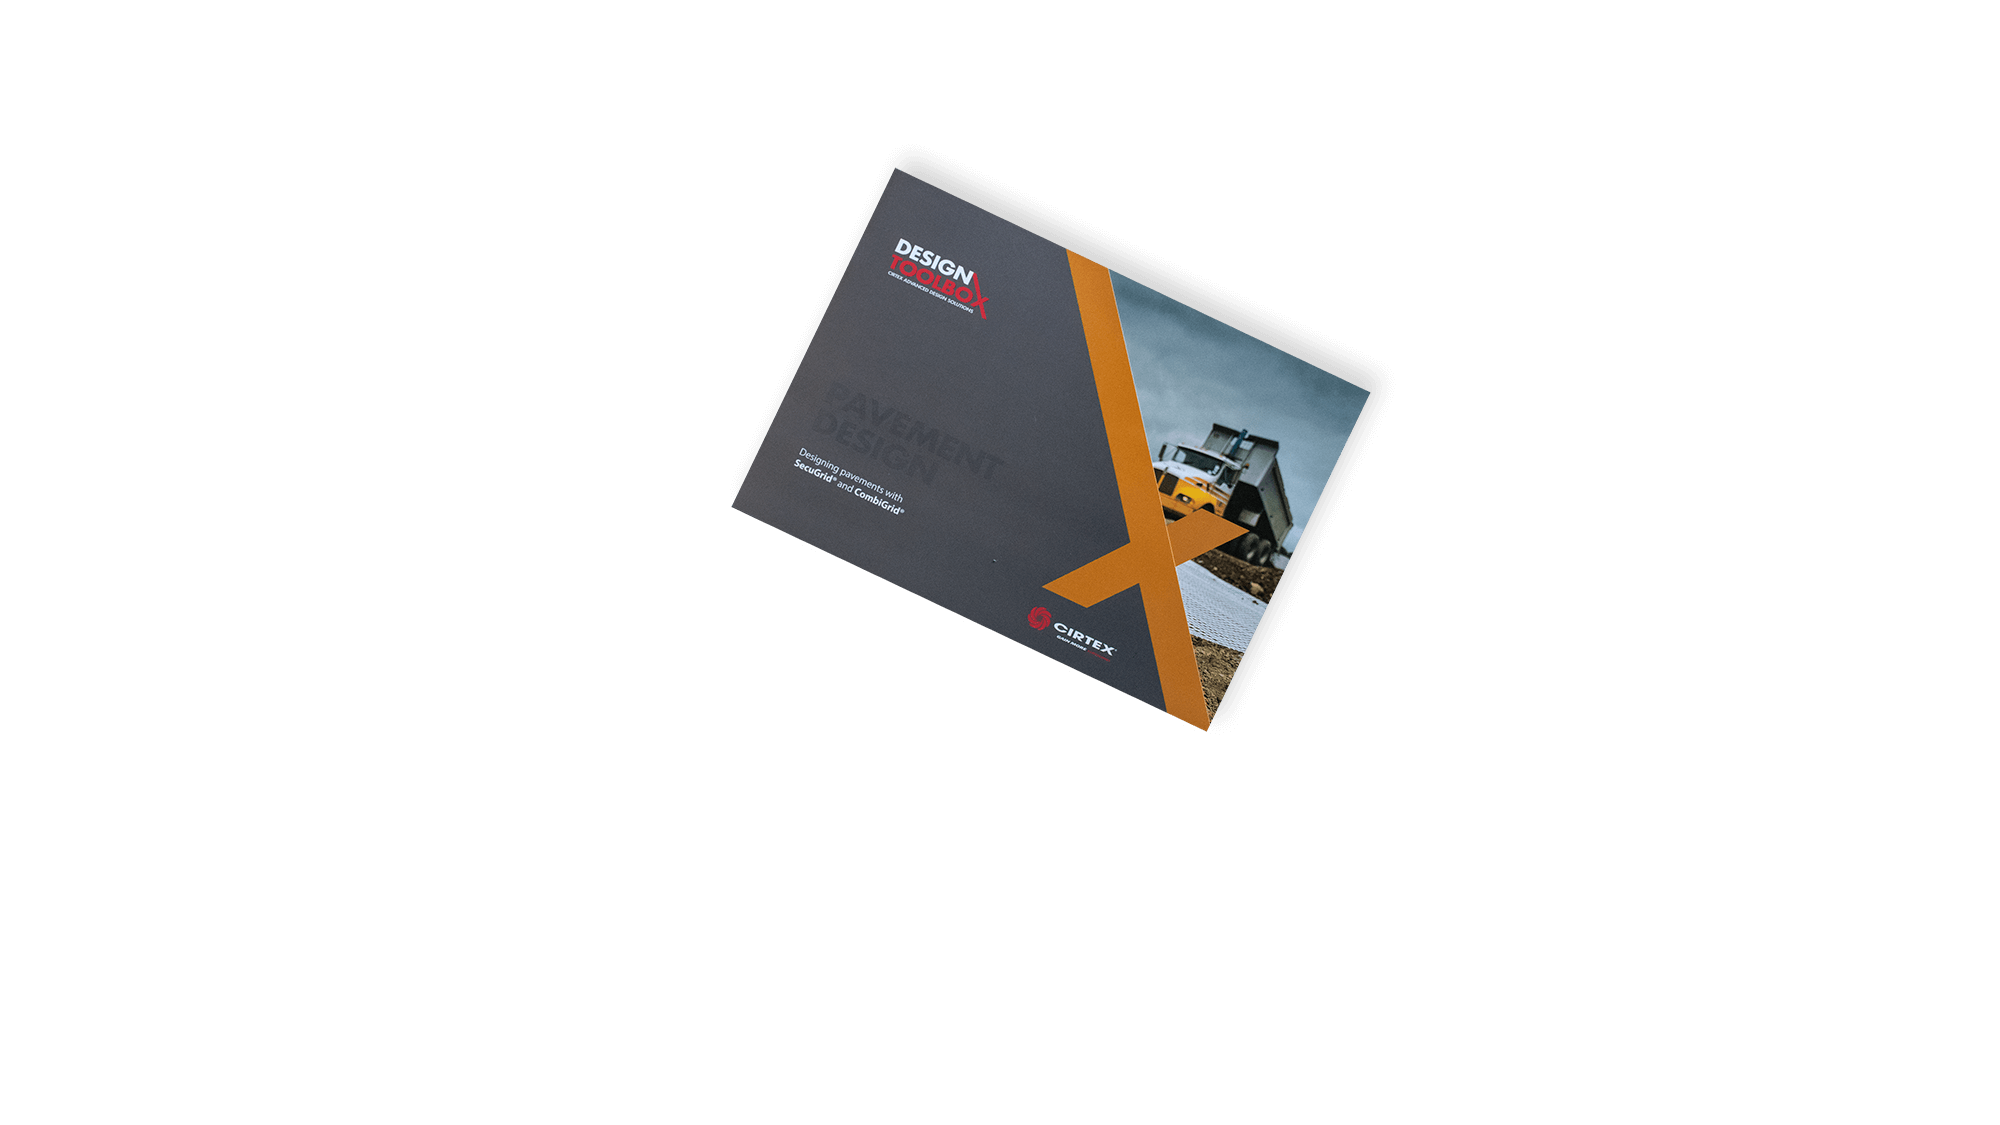 design-toolbox-pavements